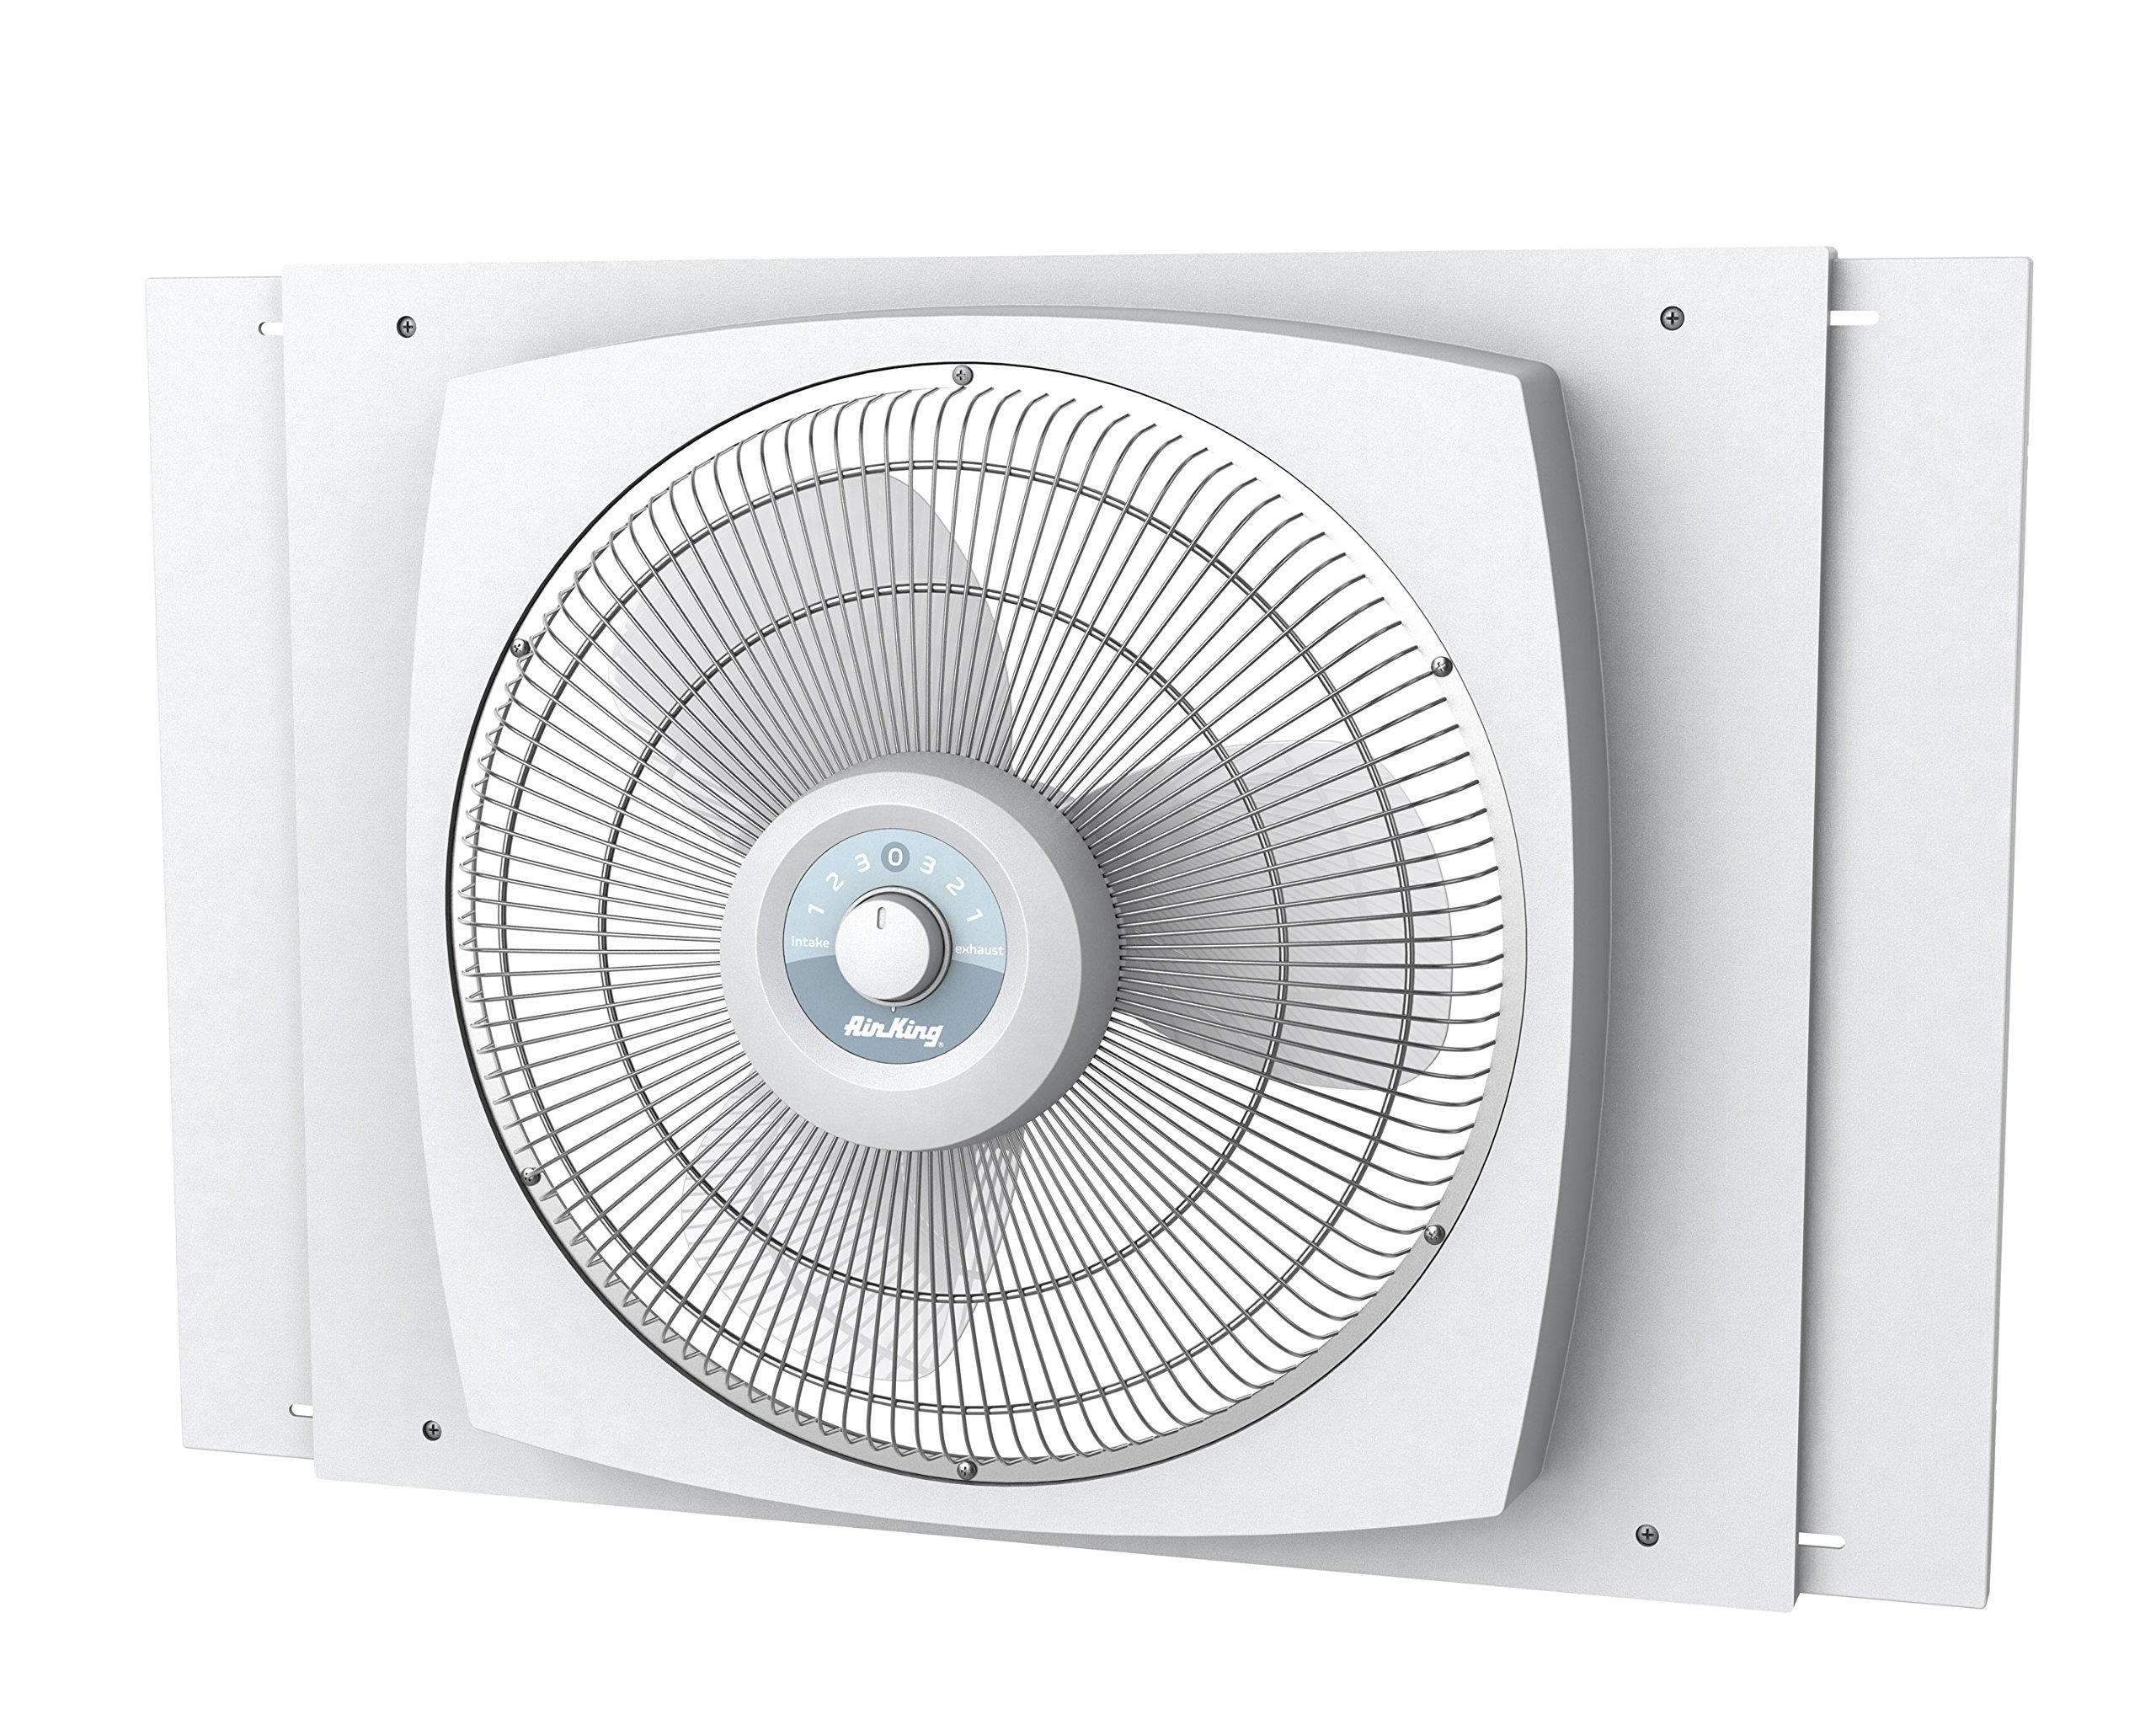 Air King 9155 Window Fan, 16-Inch by Air King